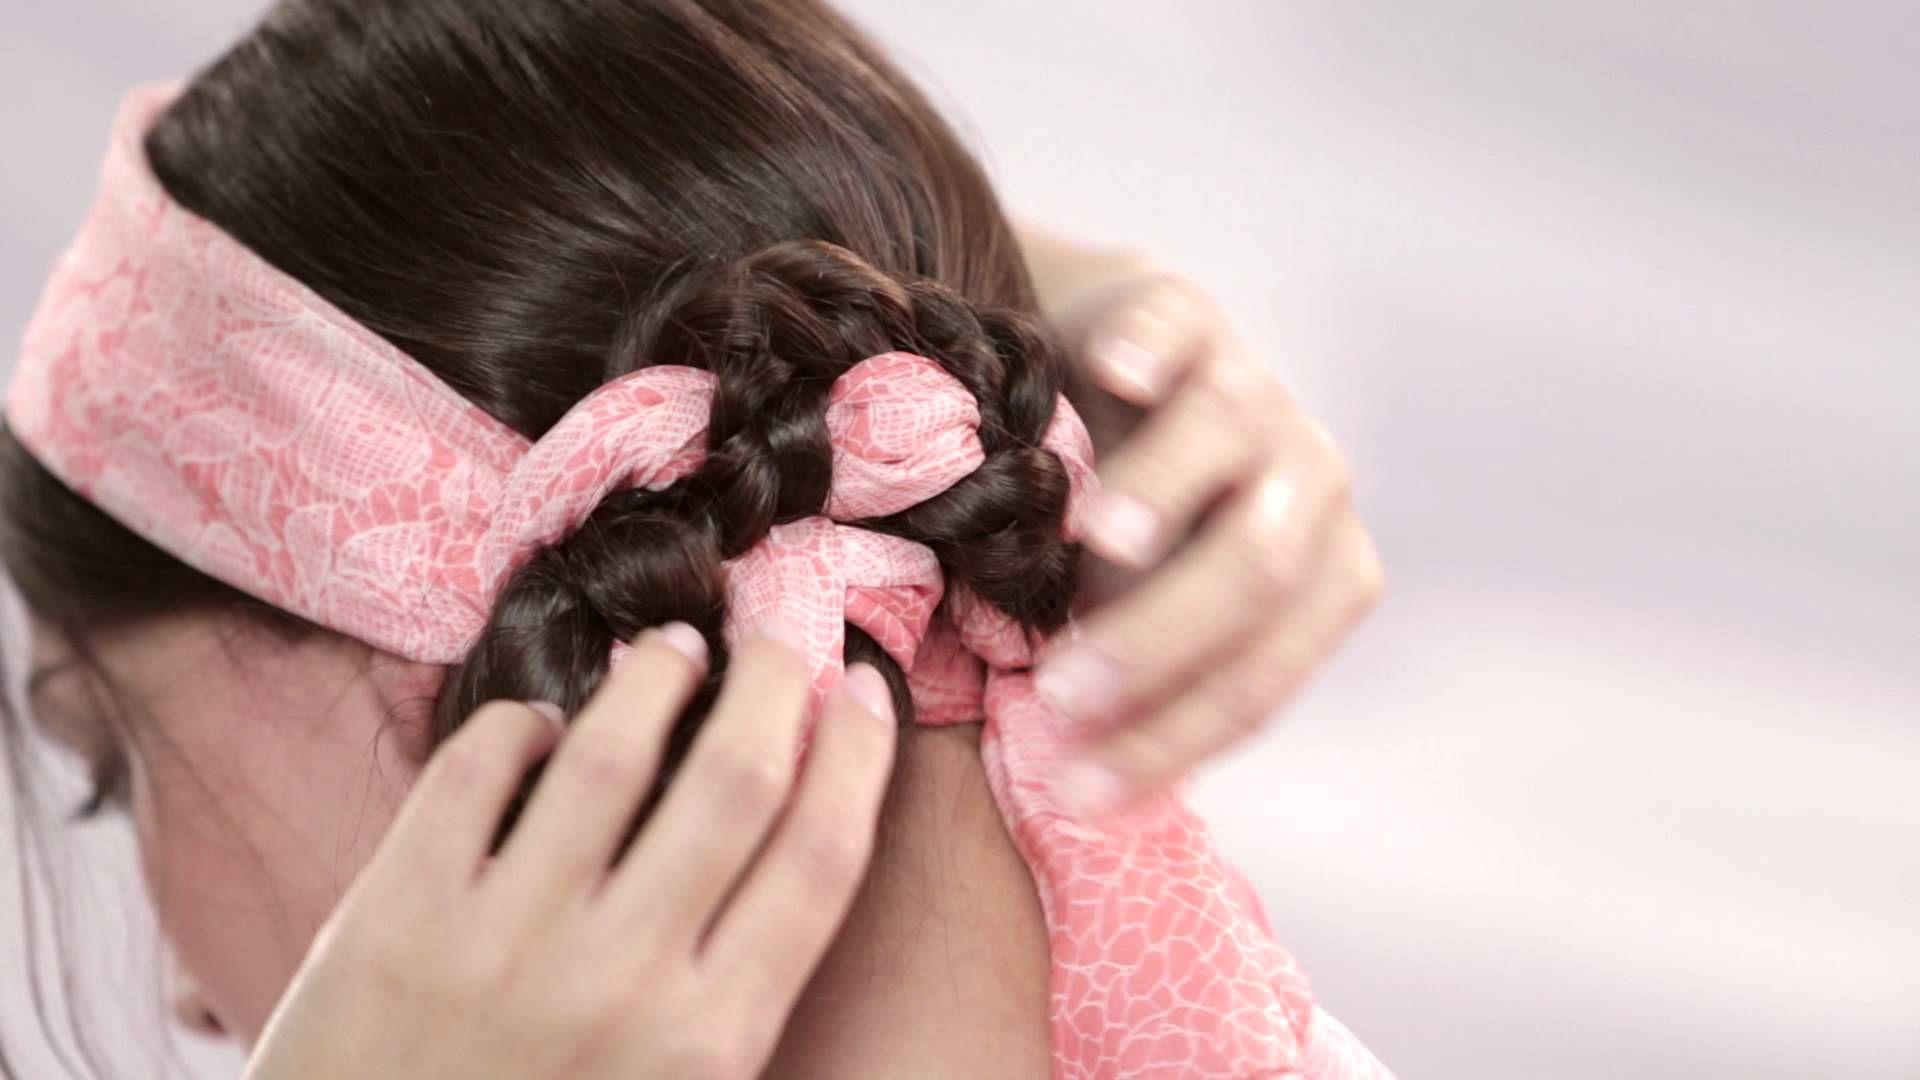 Scarf Hairstyles - How To Create A Head Scarf Hair Braid - Pureology